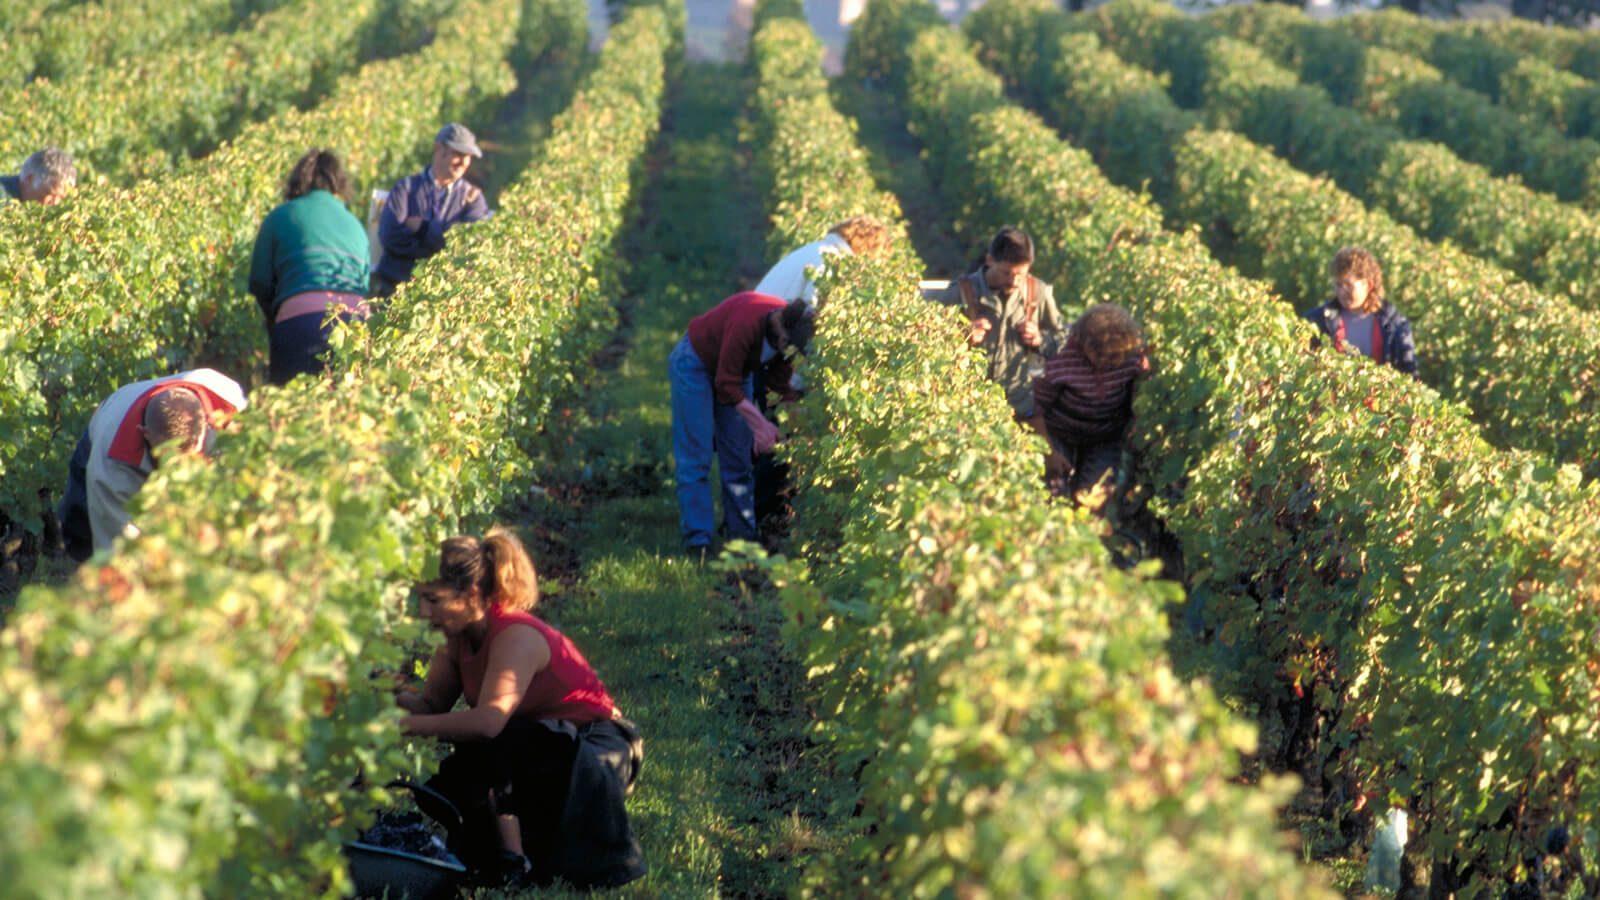 oblasť vína bordeaux